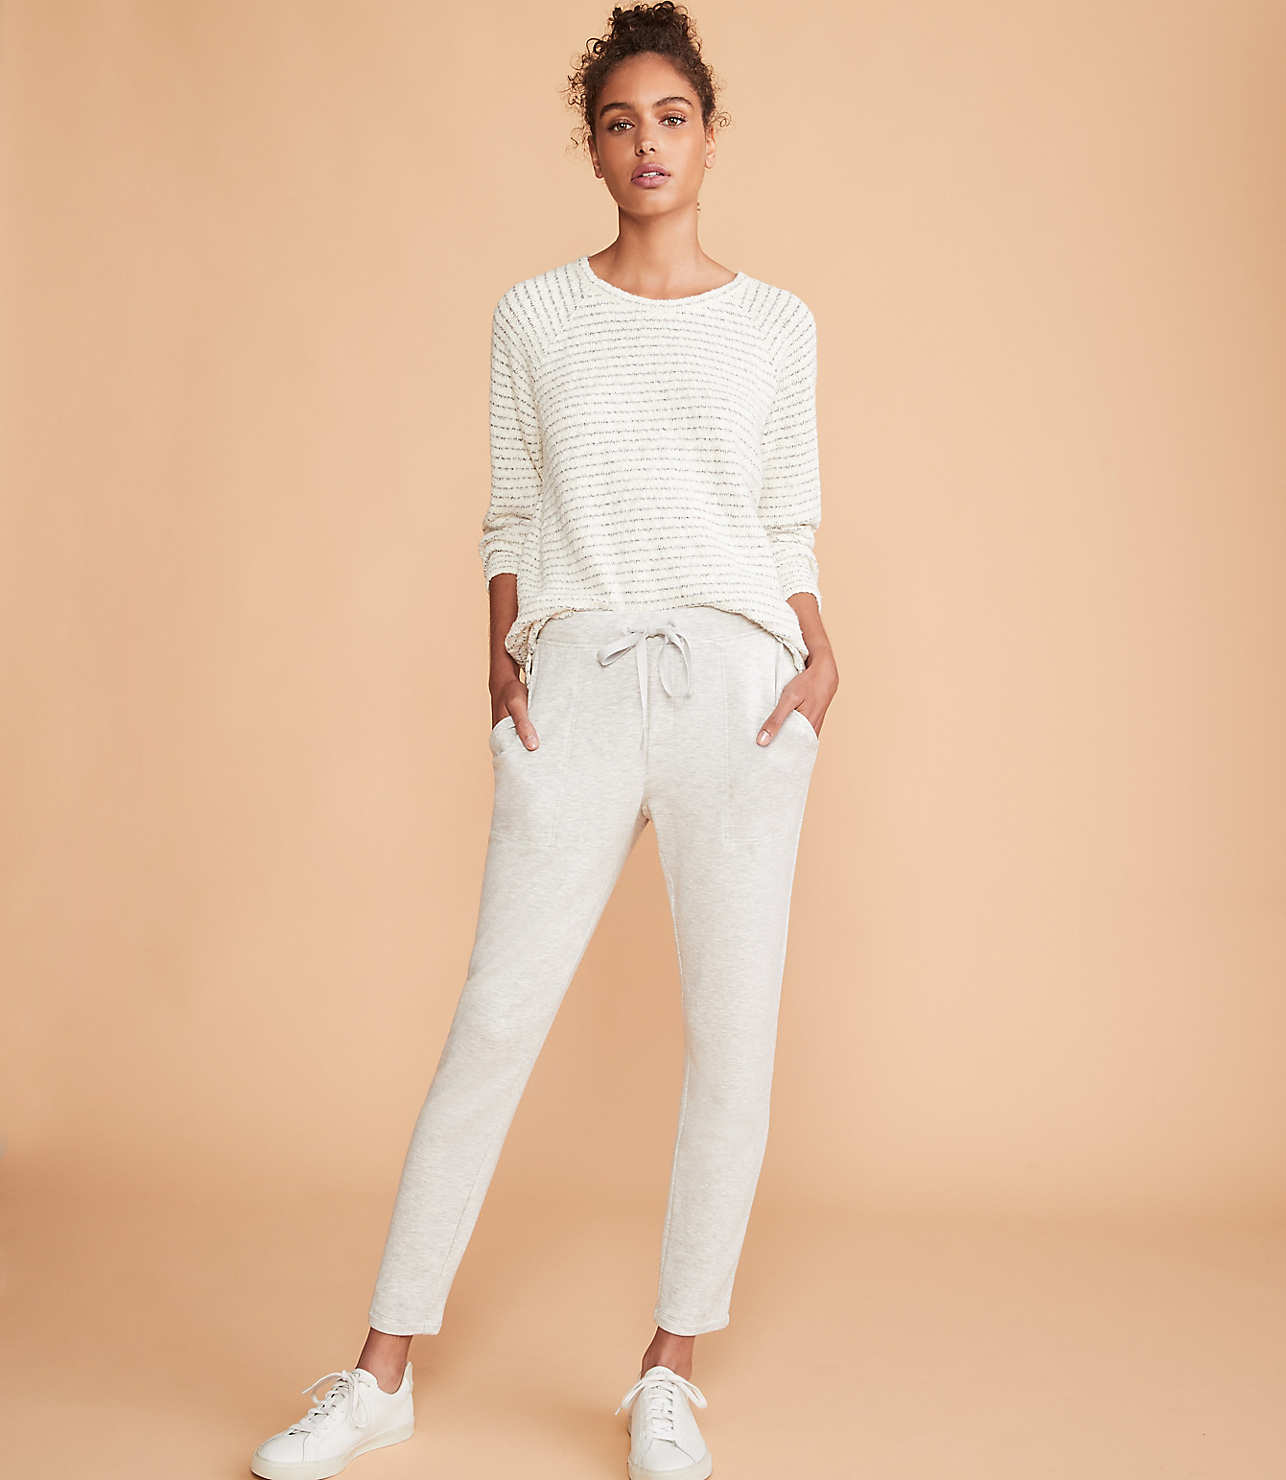 Lou & Grey Signature Softblend Sweatpants, the best loungewear, the best sweat pants, athleisure